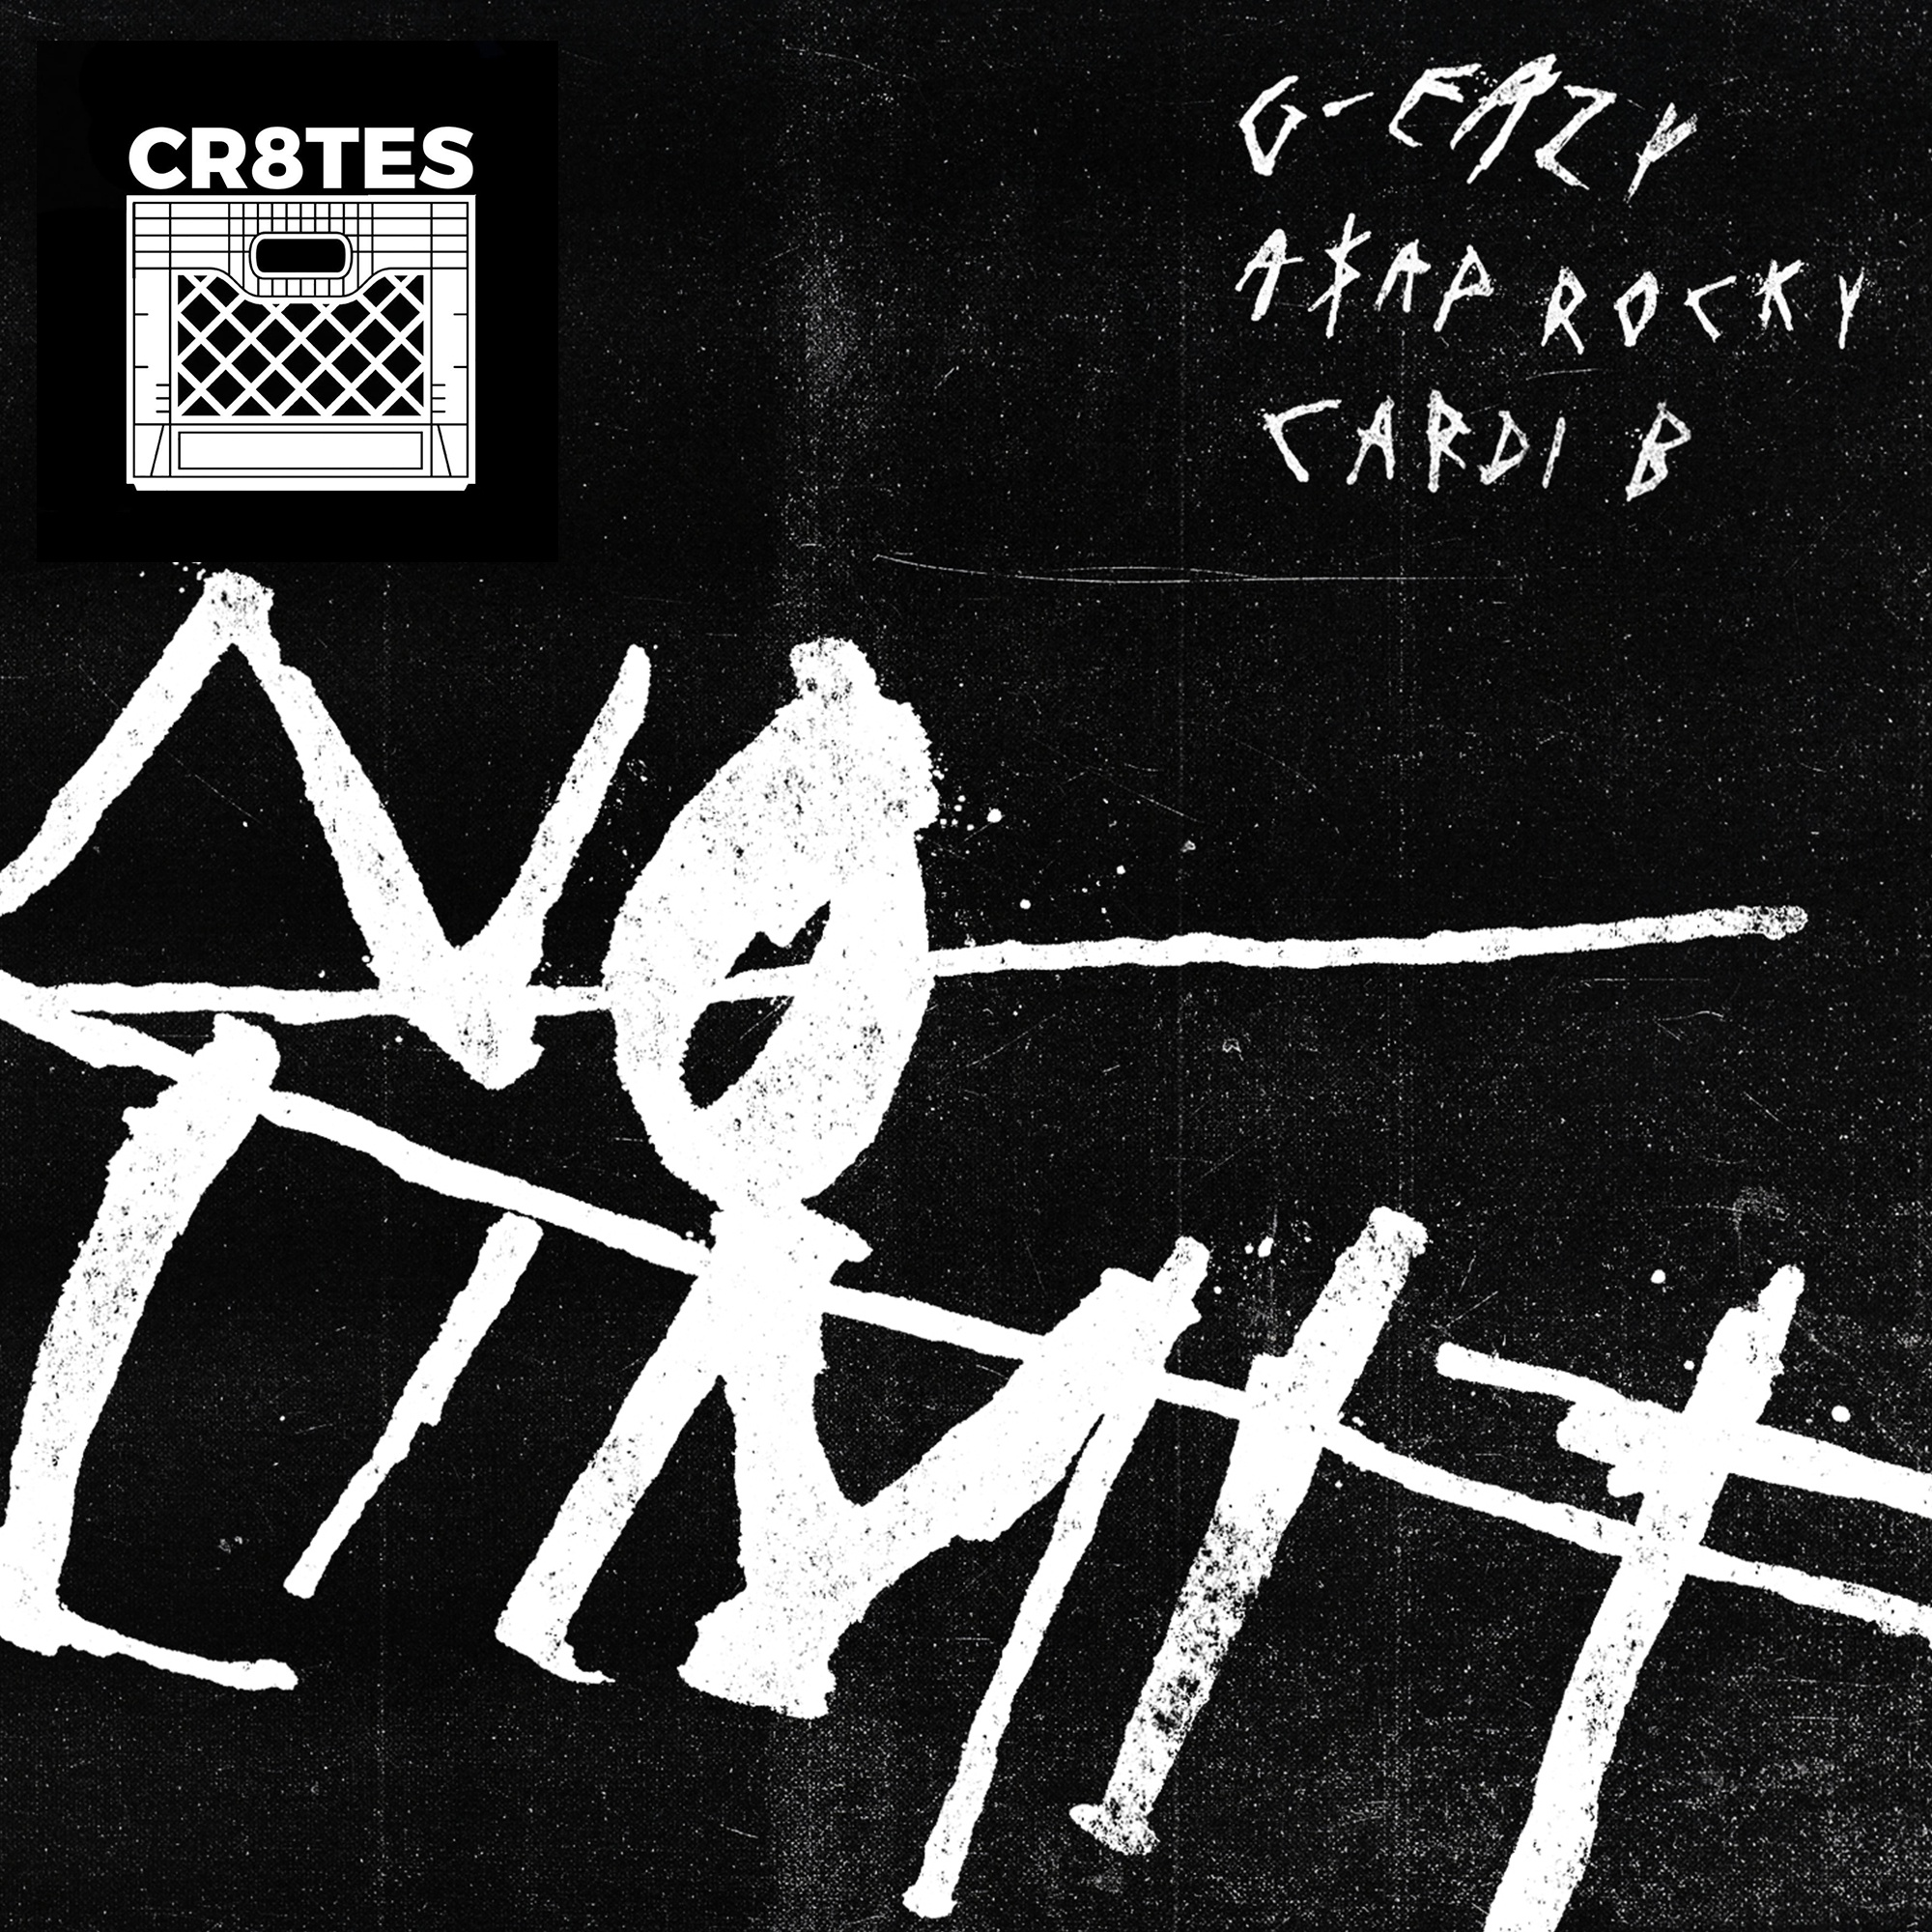 G-Eazy - No Limit (Audio) ft. A$AP Rocky_Cardi B (CR8TES MINI KIT).zip